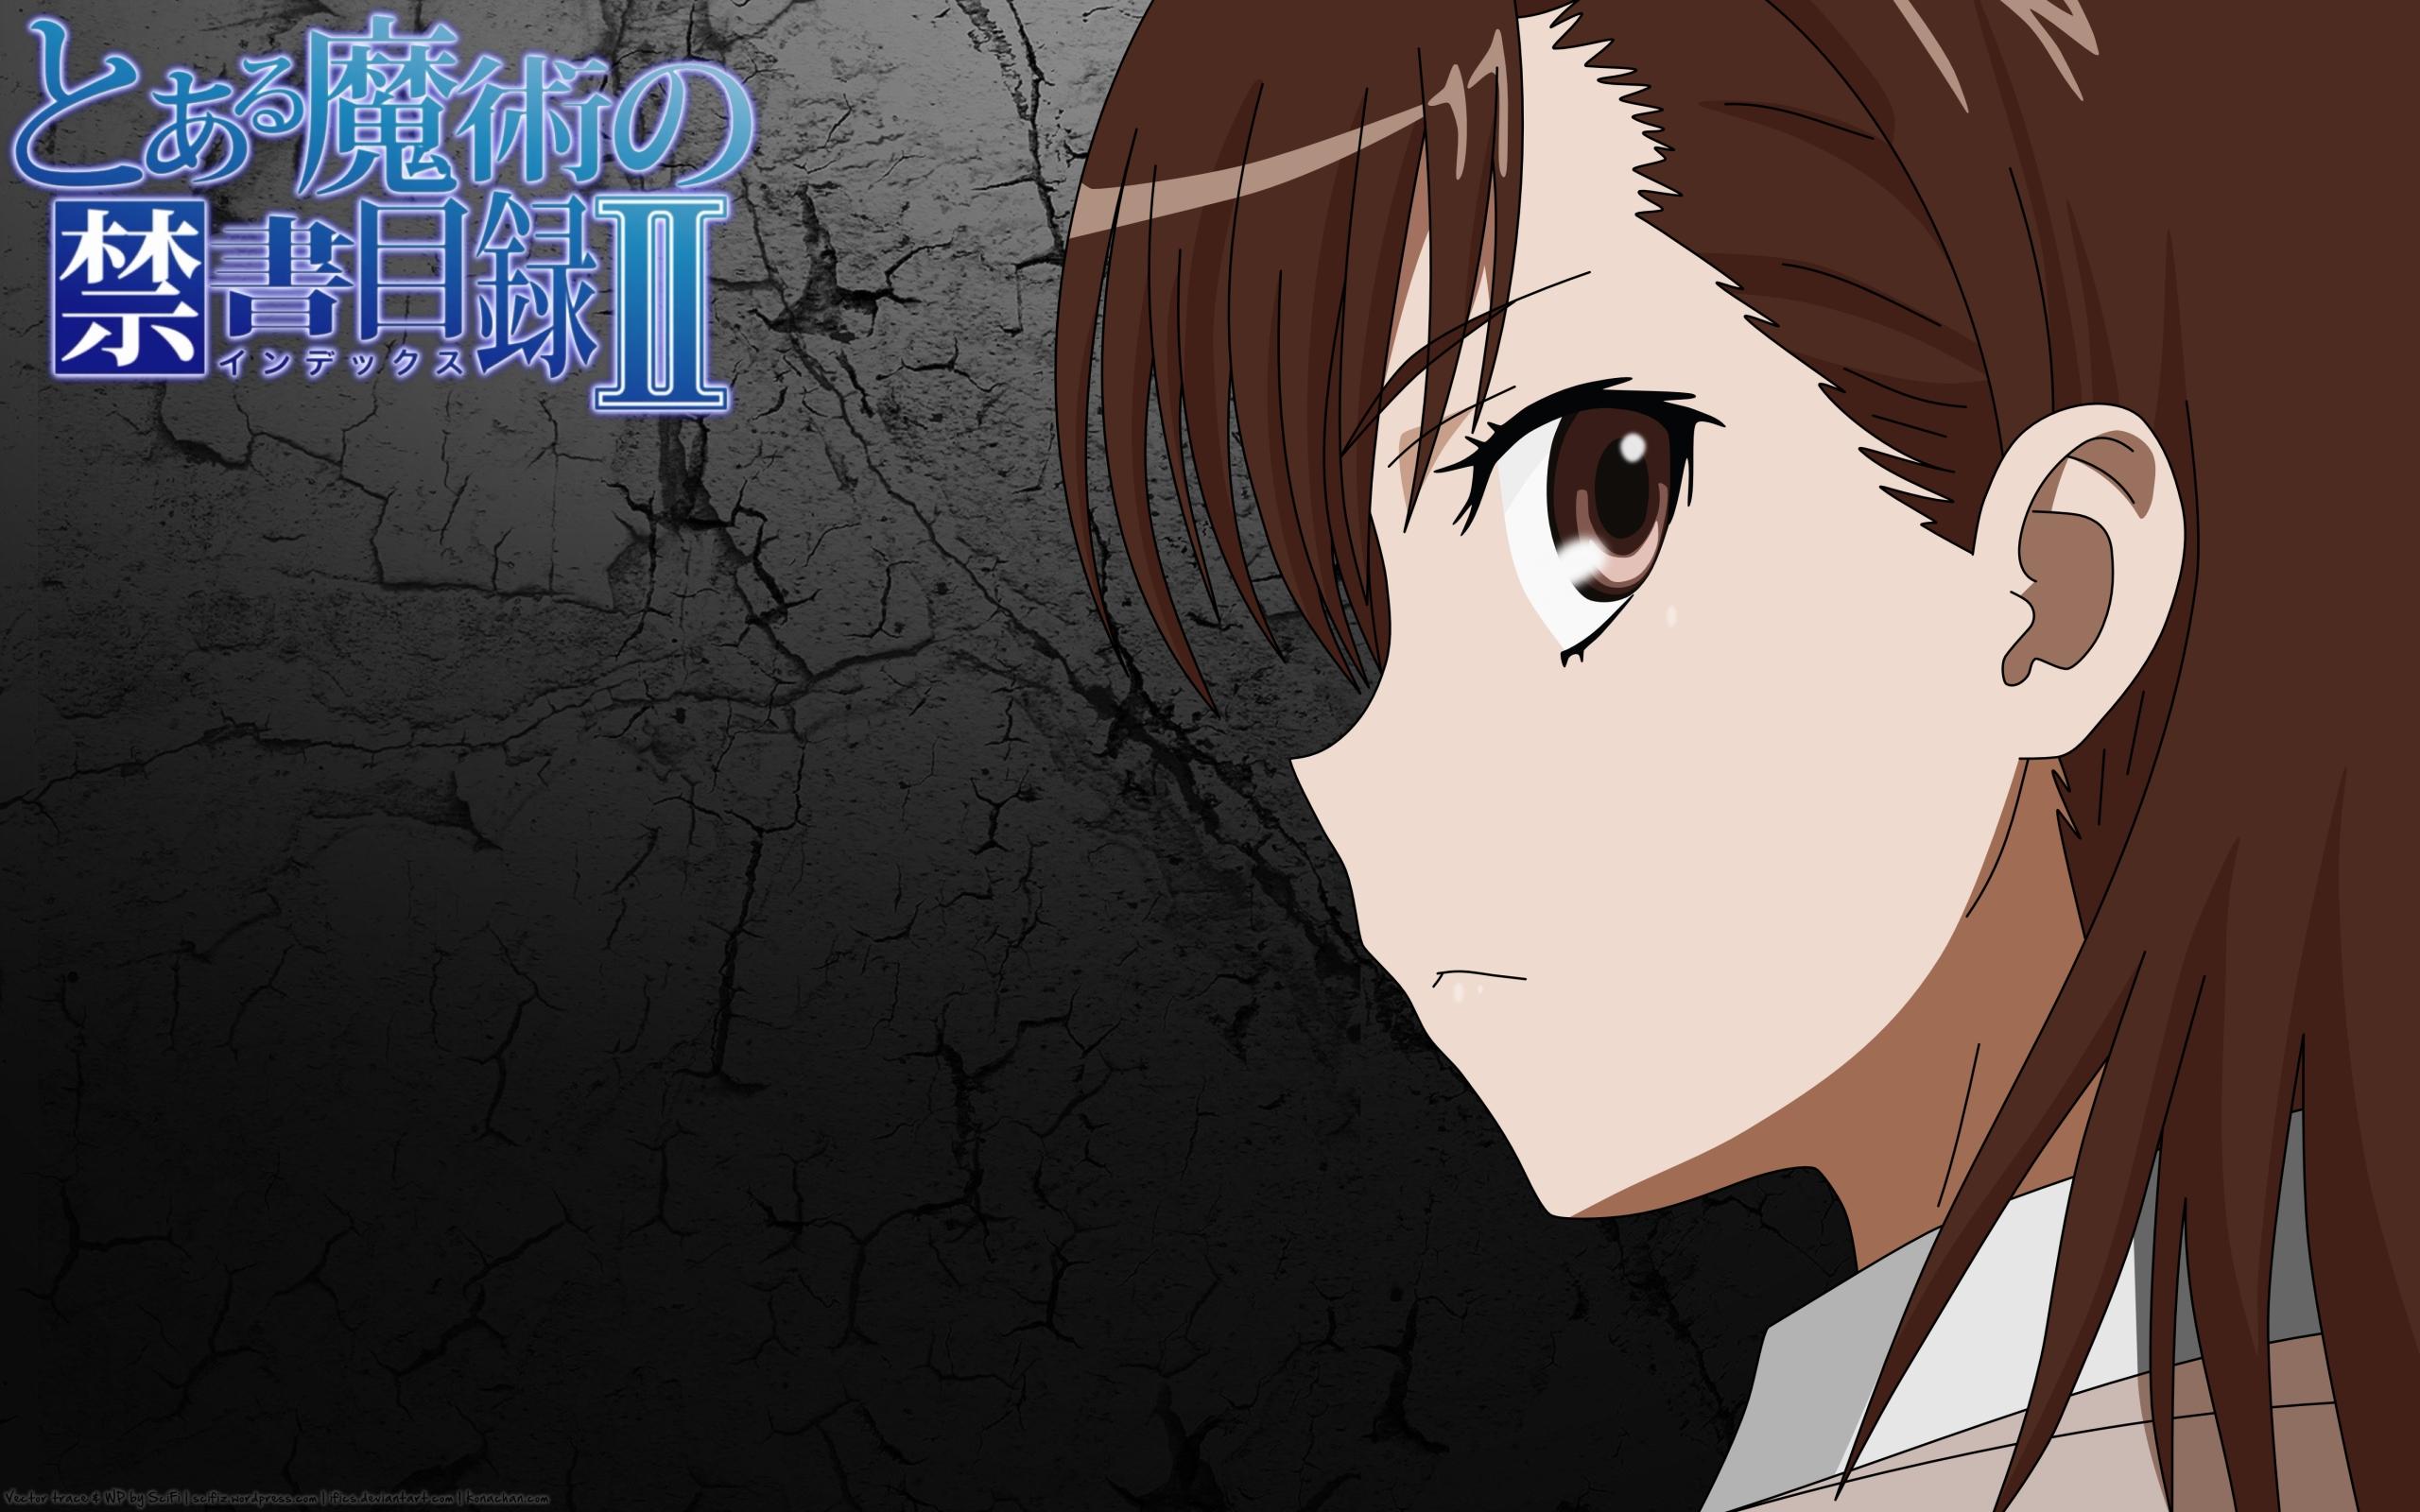 Профиль картинки аниме